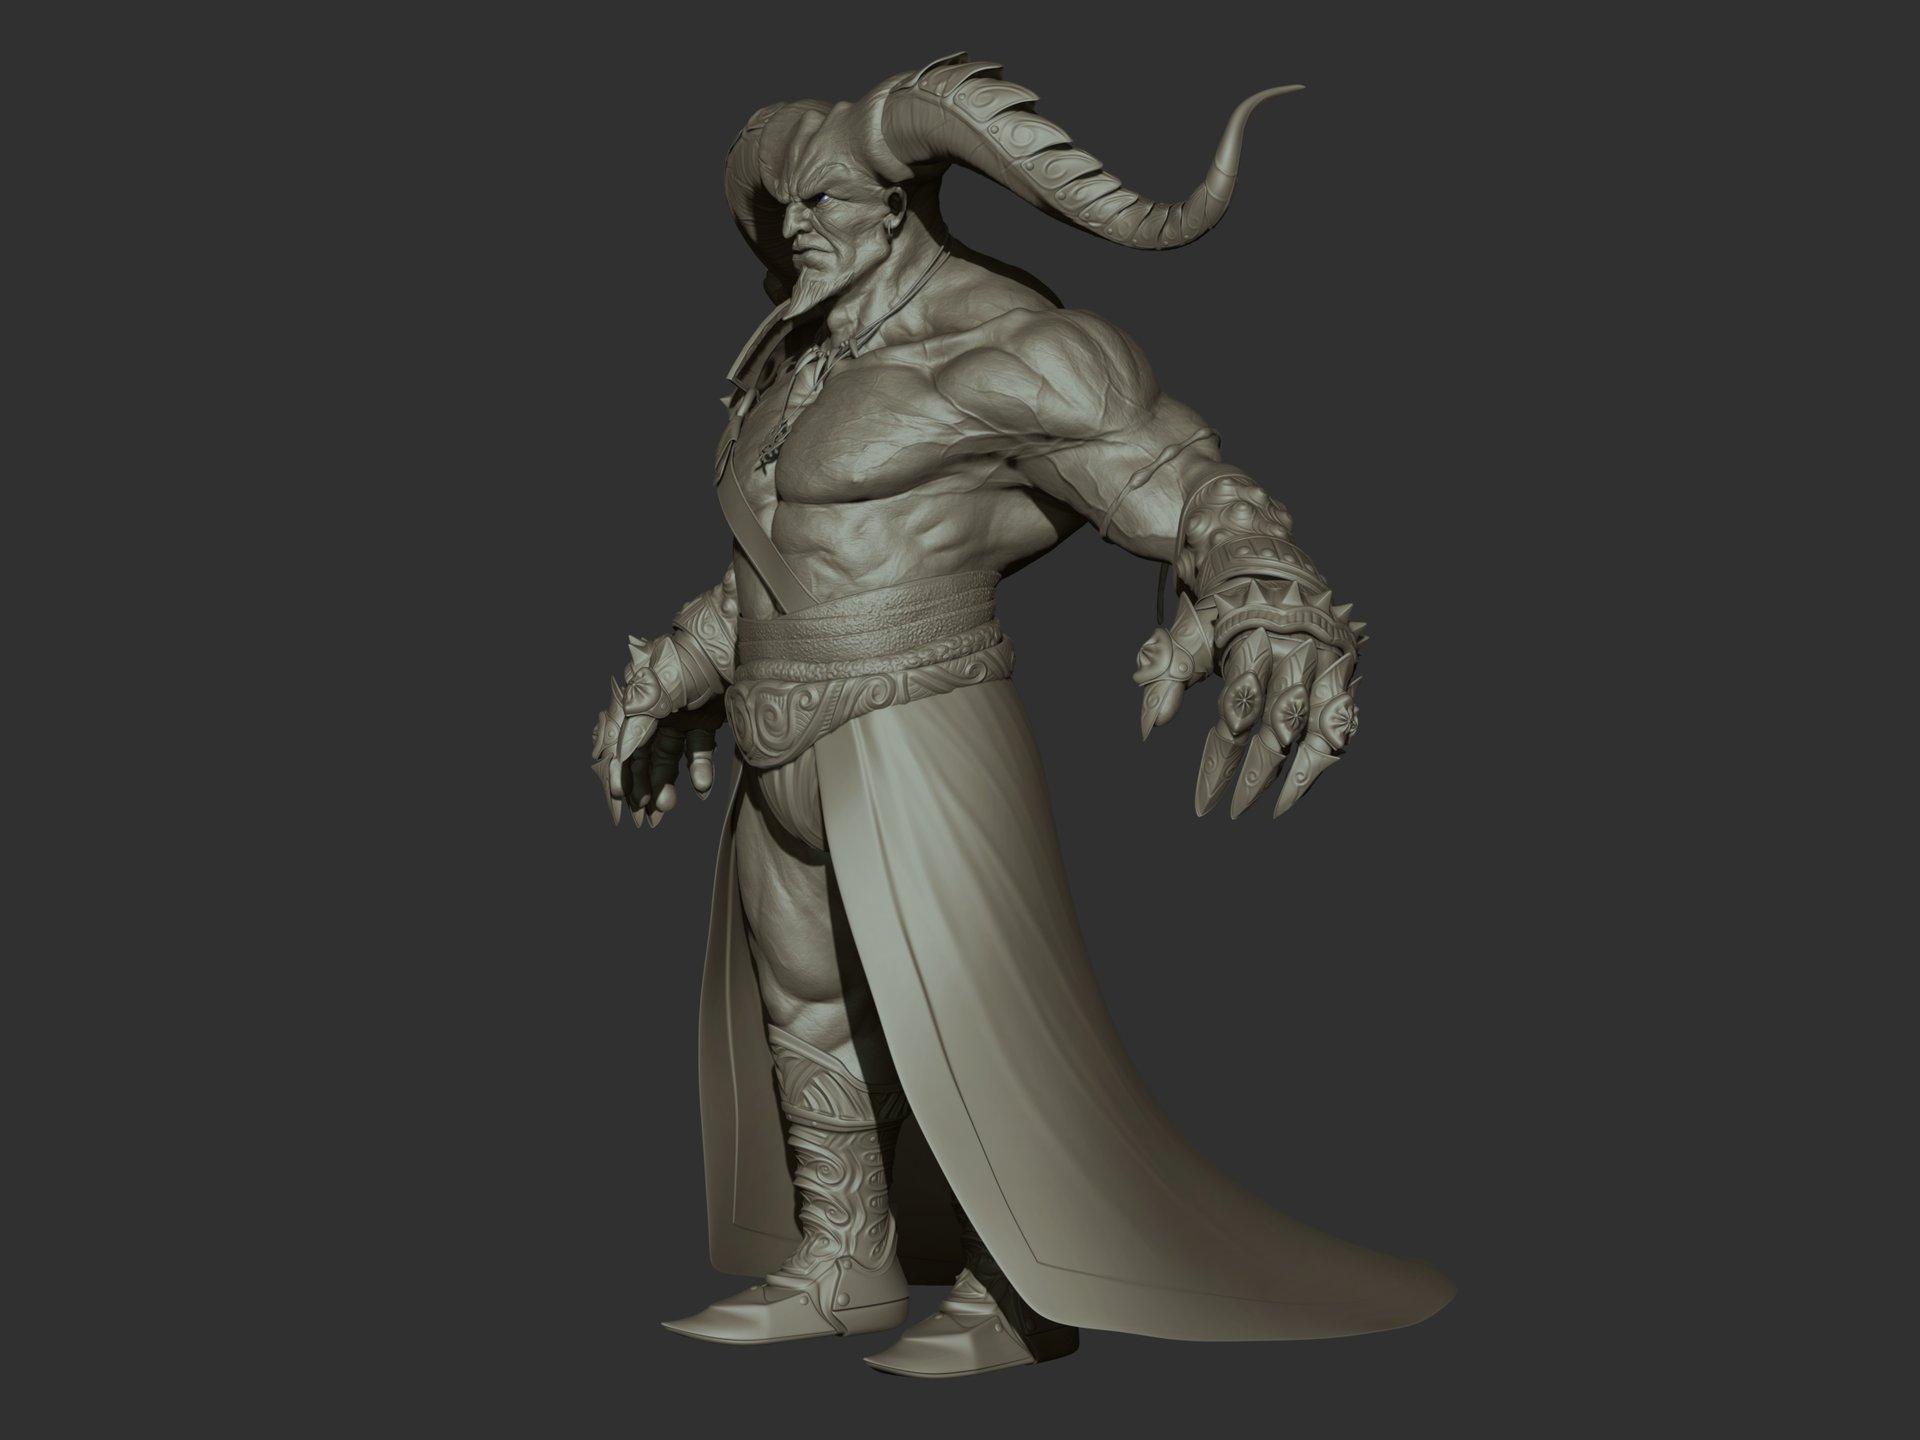 Ganesh poojari helllord002